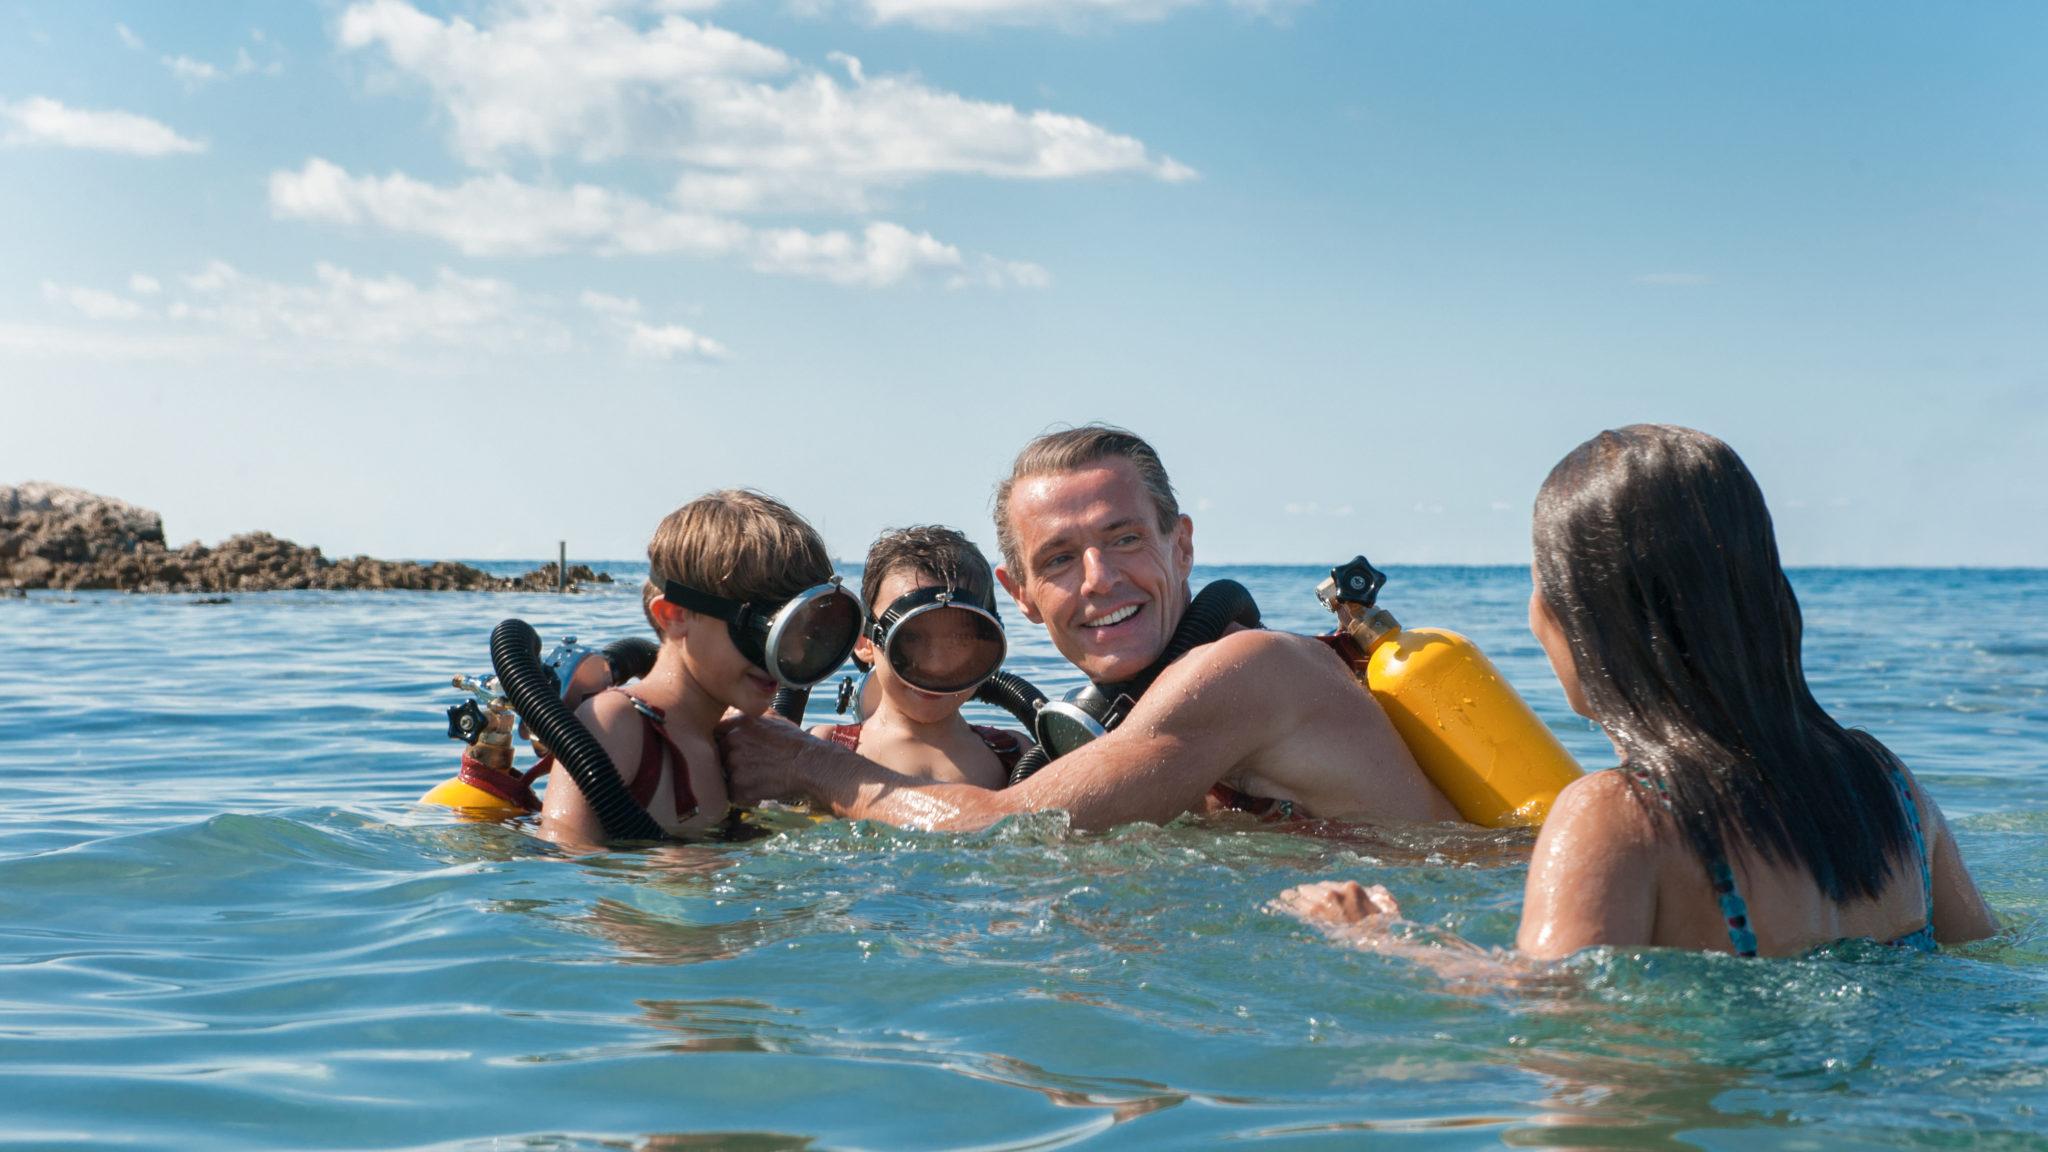 blog-mode-homme-strasbourg-lifestyle-critique-cine-cinema-pierre-niney-LOdyssee-Film-Cousteau